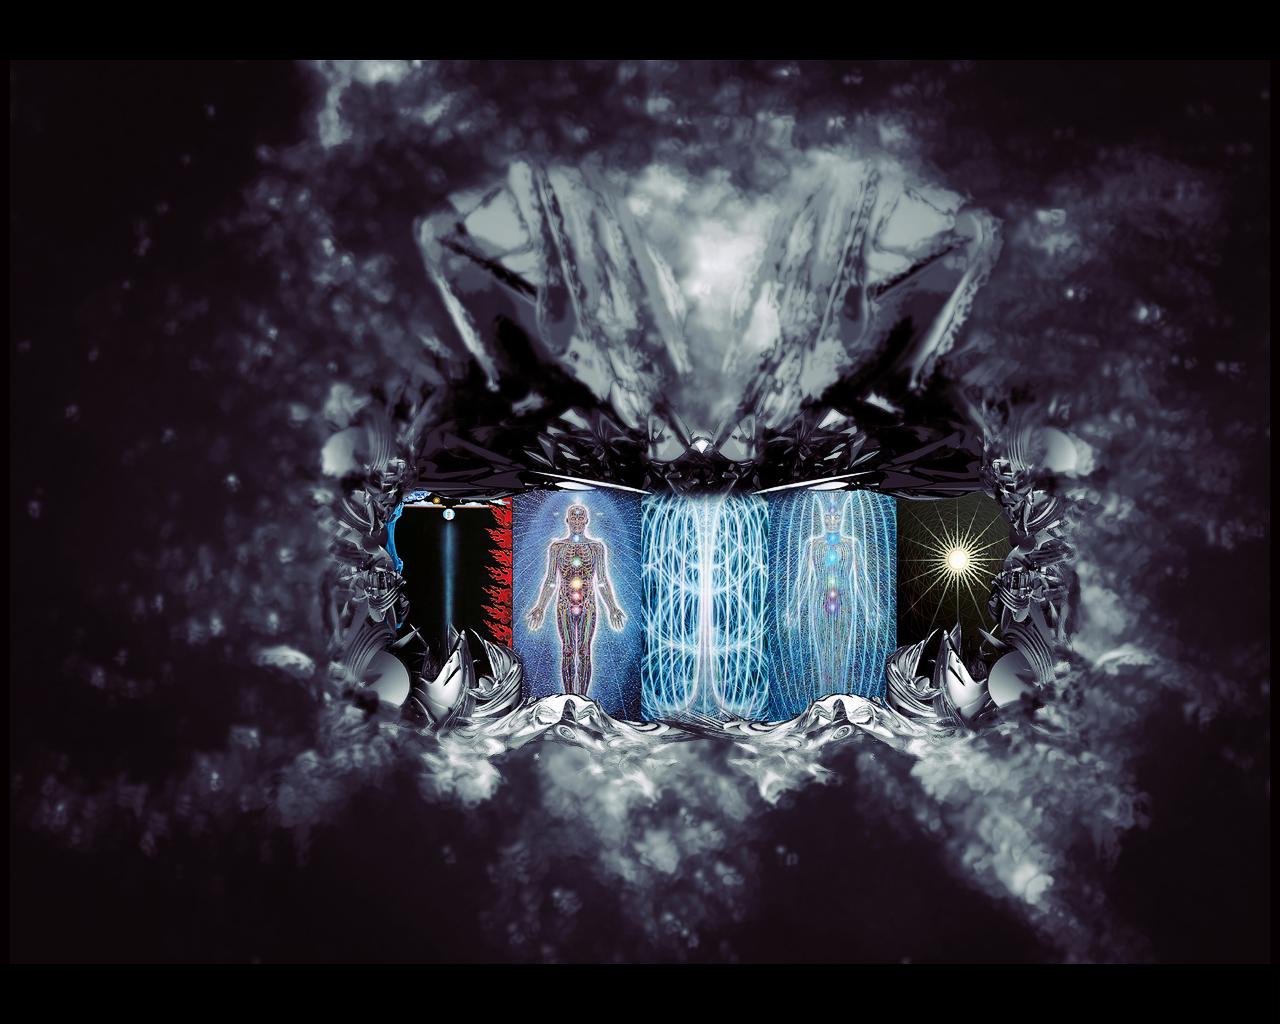 alex grey 39 s cosm 1280x1024 by alfdclxvi on deviantart